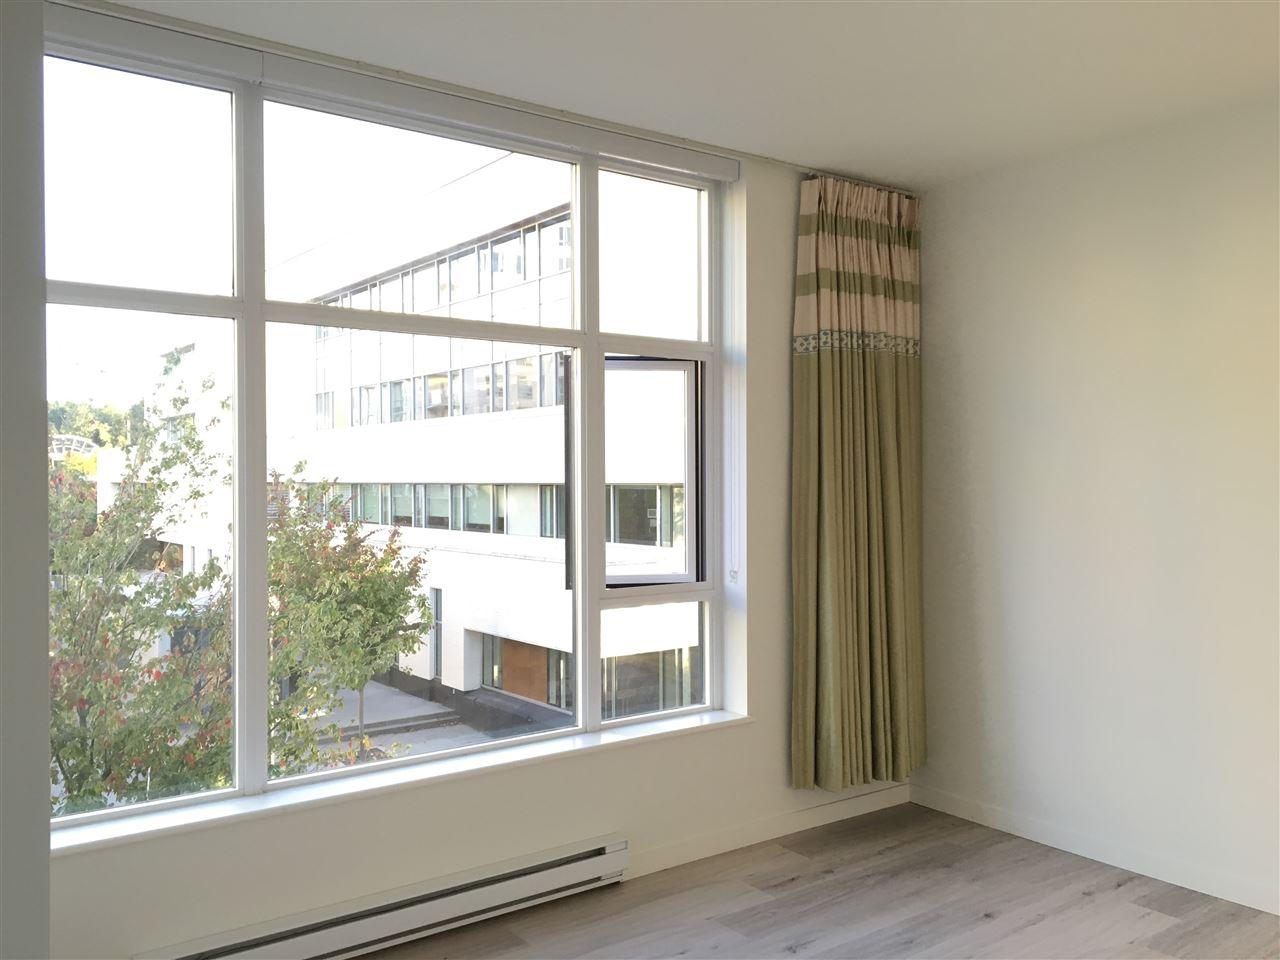 Condo Apartment at 303 6093 IONA DRIVE, Unit 303, Vancouver West, British Columbia. Image 14